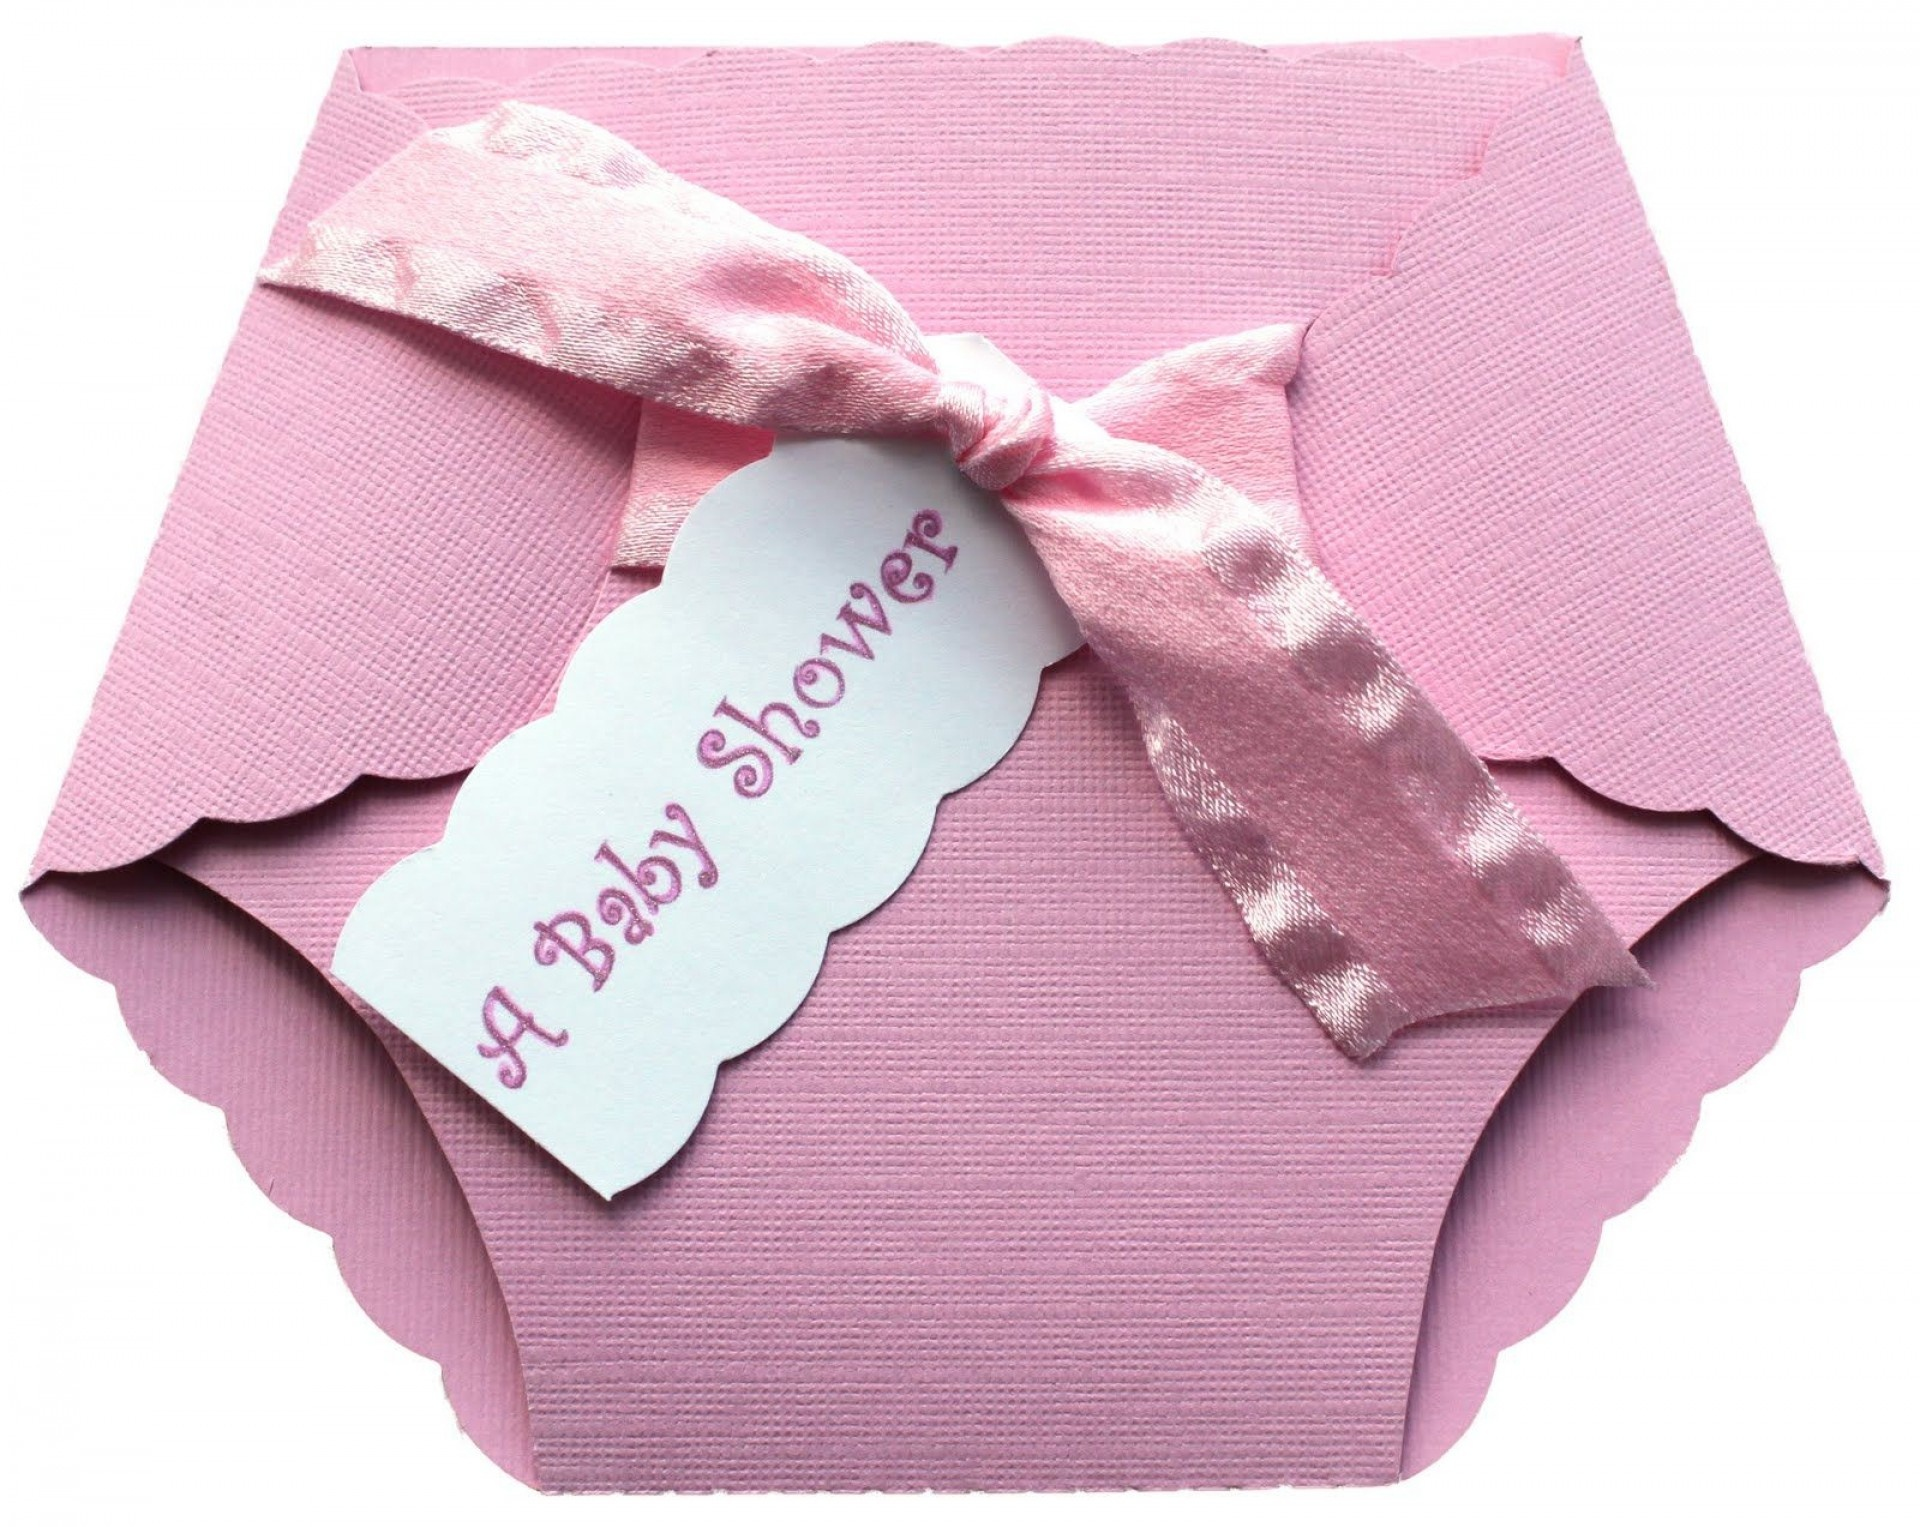 009 Free Printable Diaper Invitationmplate Inspirational Baby Shower - Free Printable Diaper Baby Shower Invitations